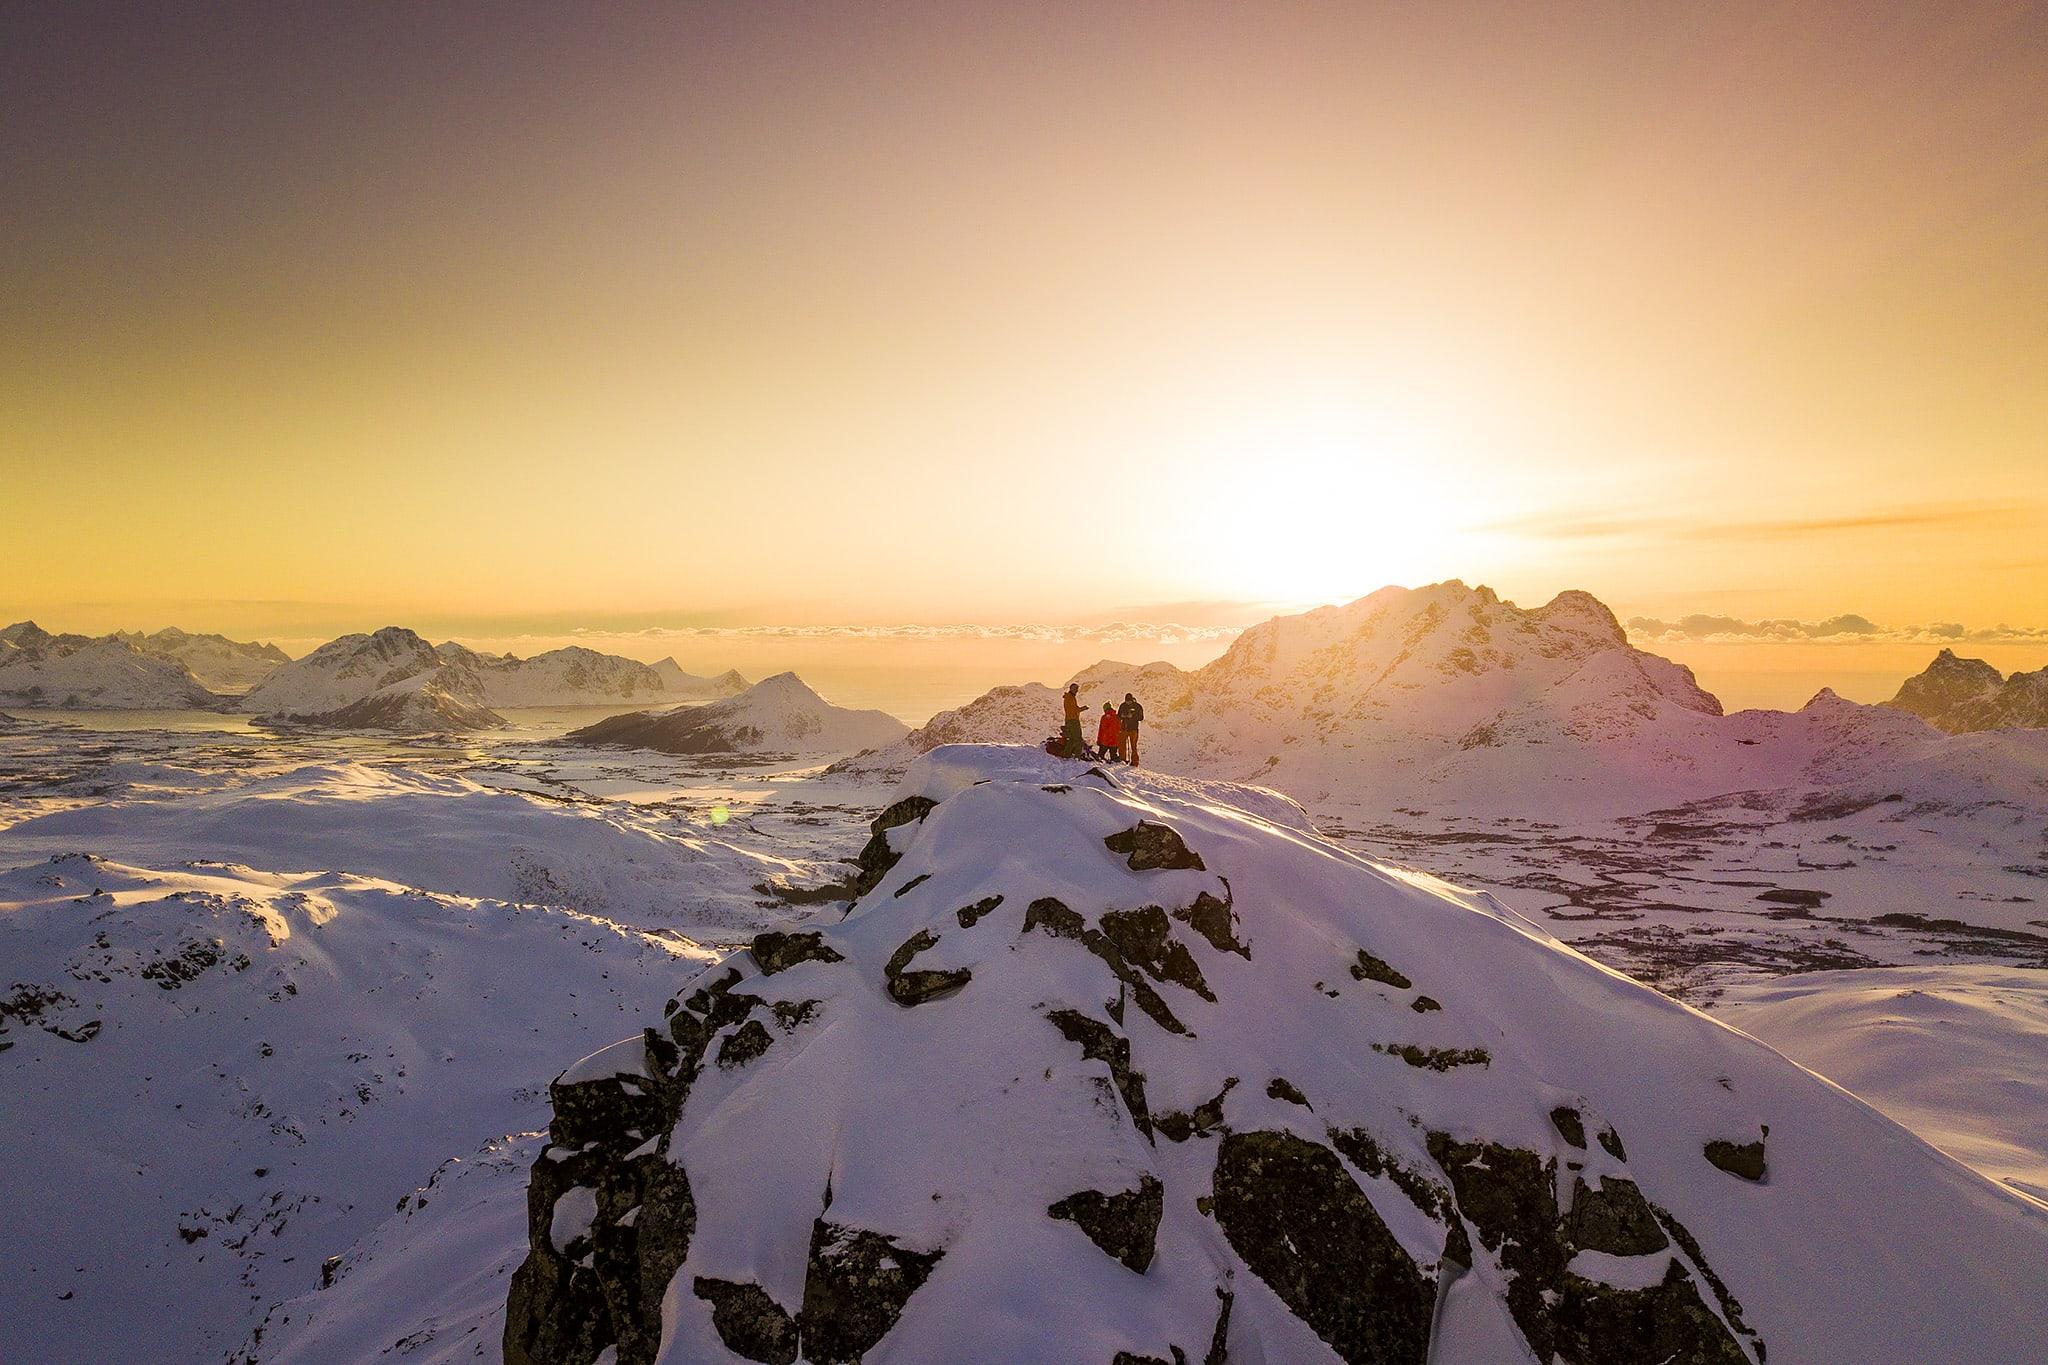 Sunset wintertime in the Lofoten islands